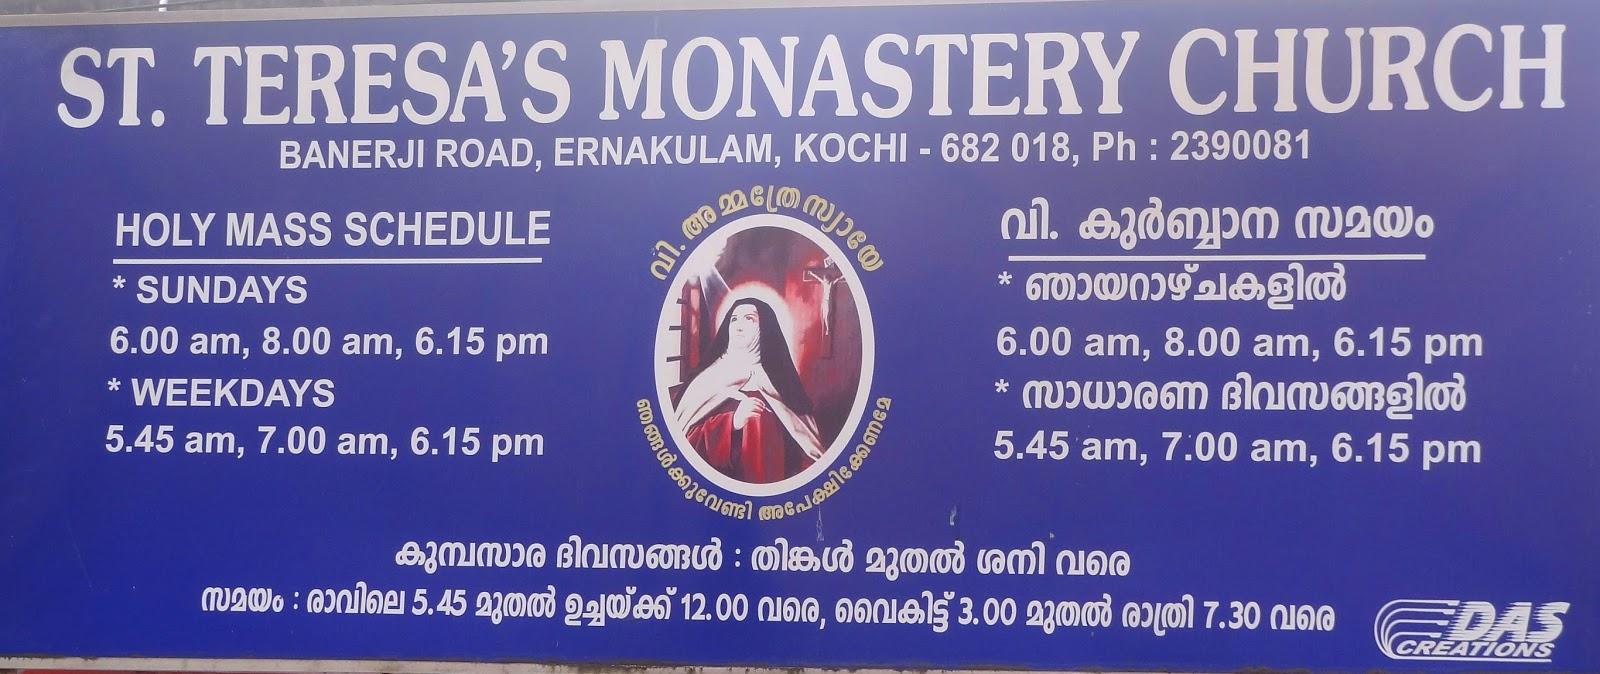 KERALA CHURCH INFOS: Ernakulam St Teresa's Monastery